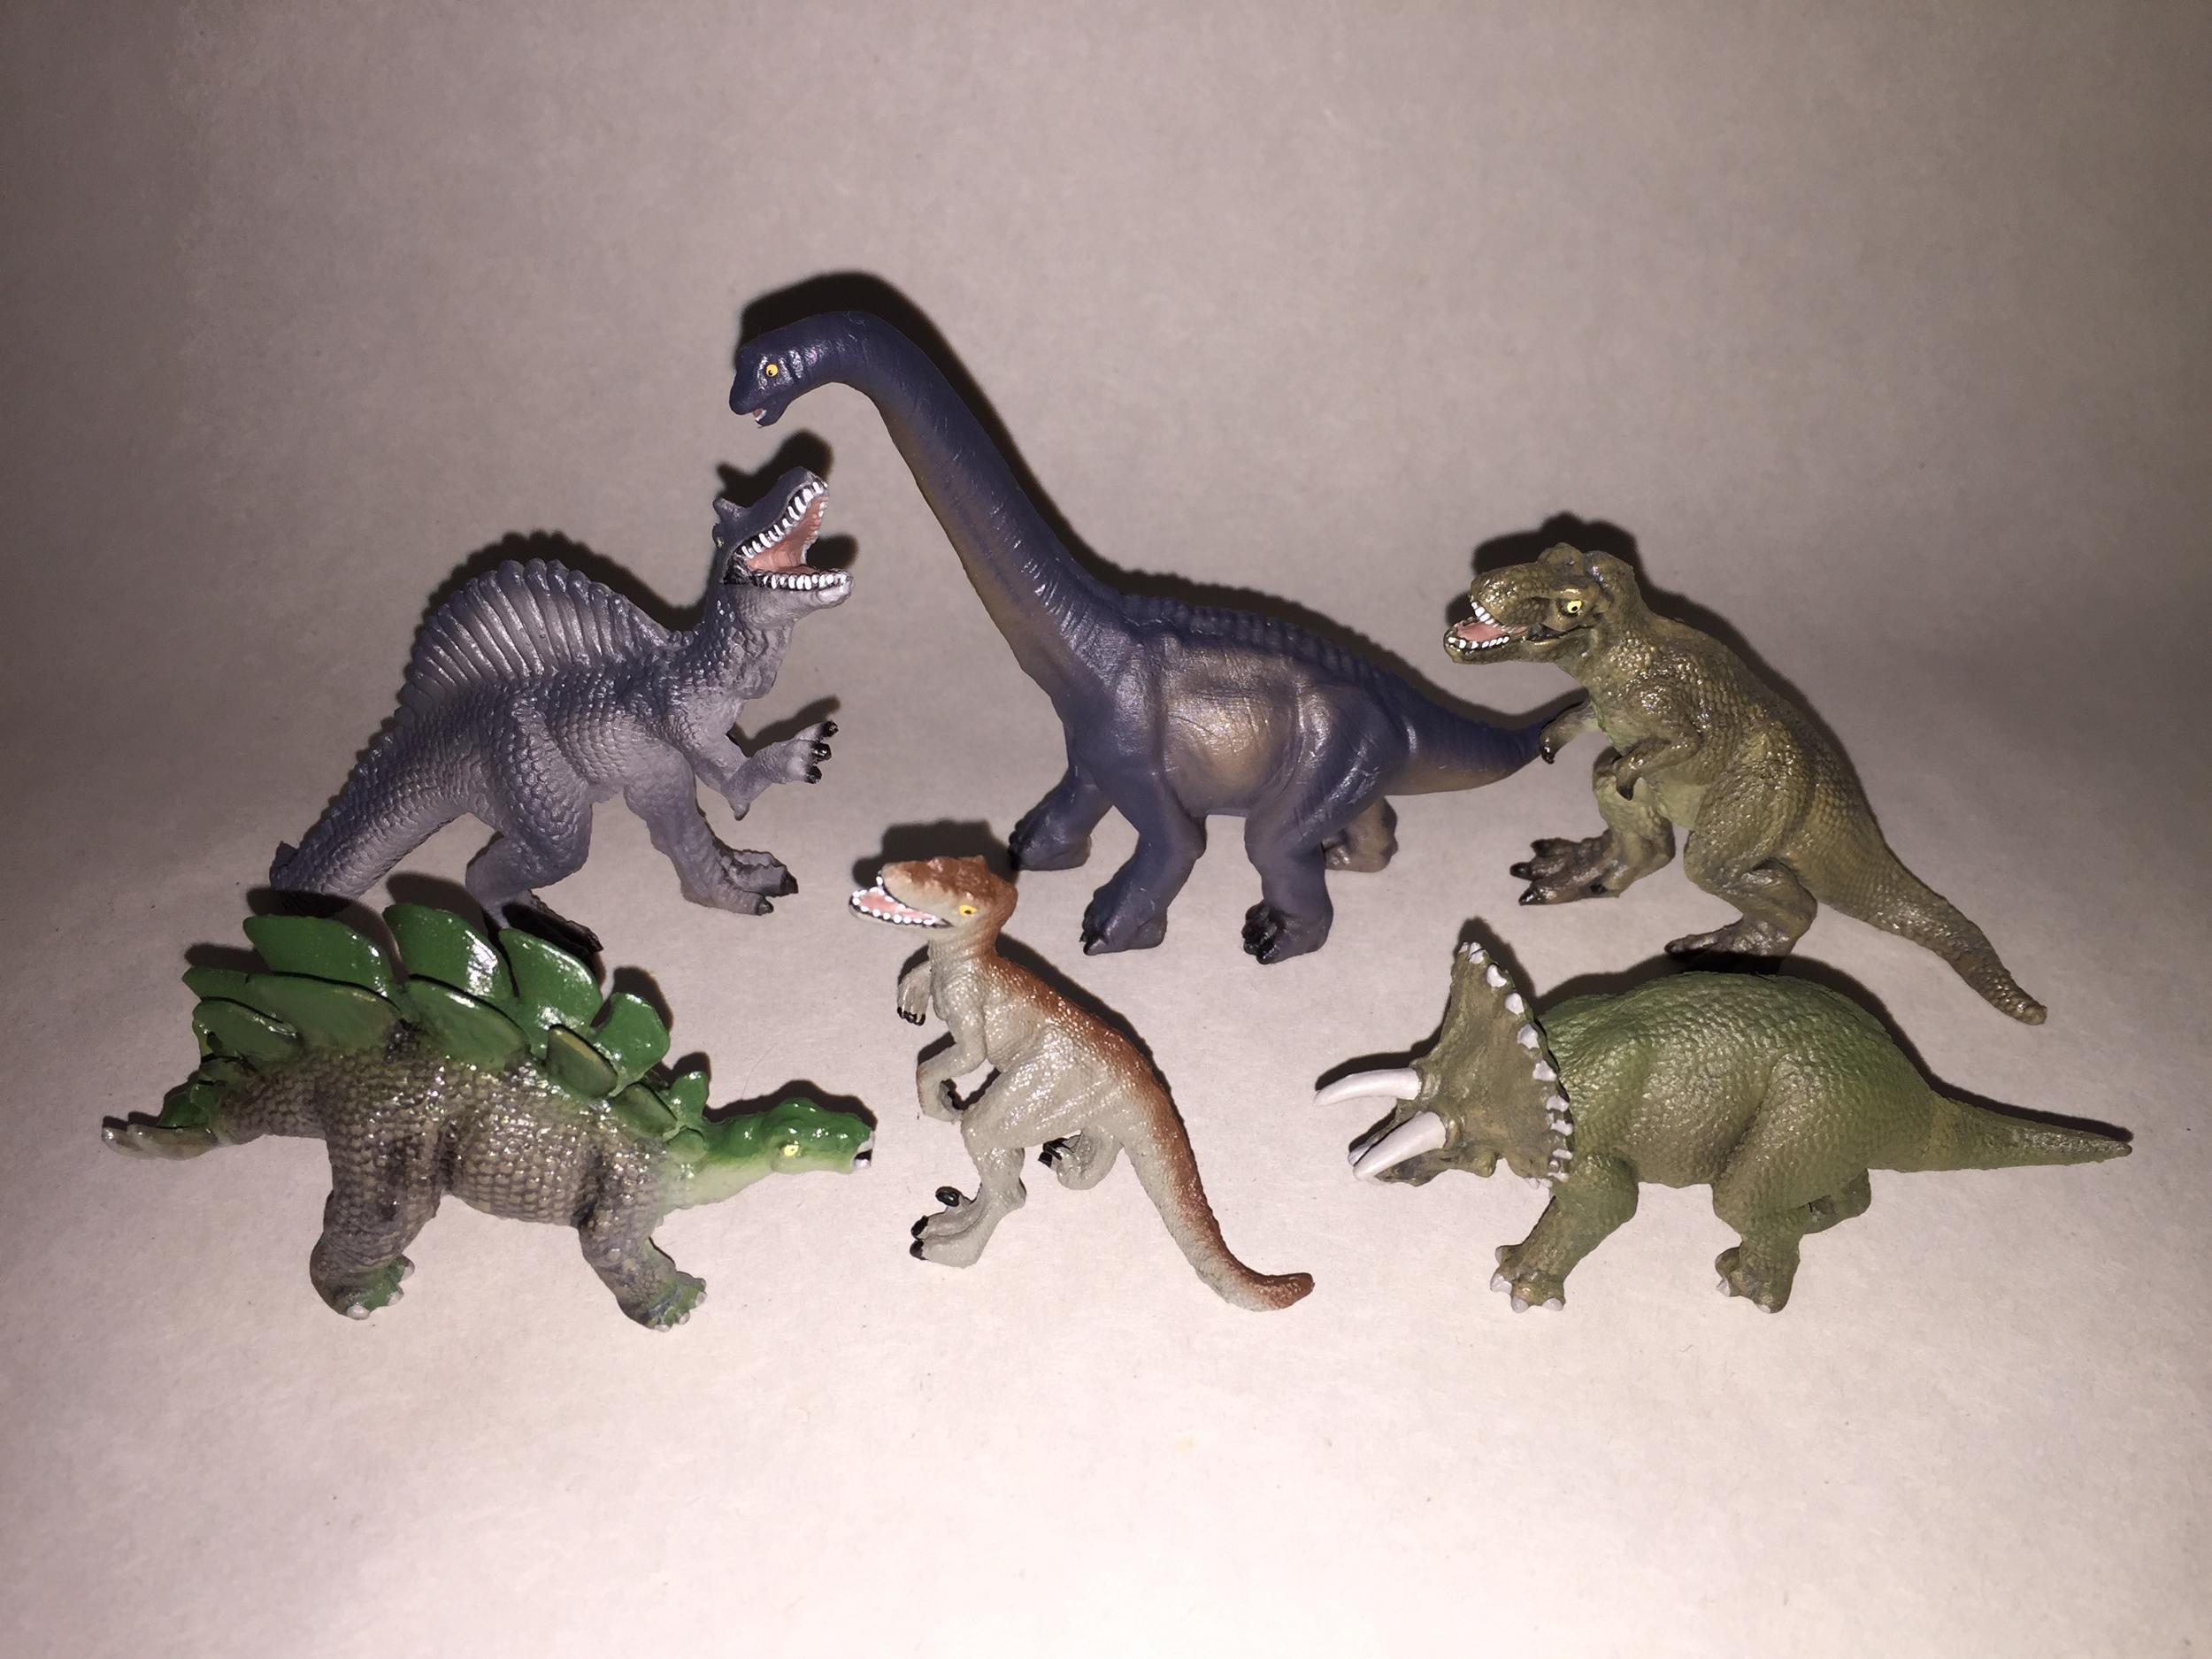 Original 2014 Mini-Tub 1 Dinosaurs